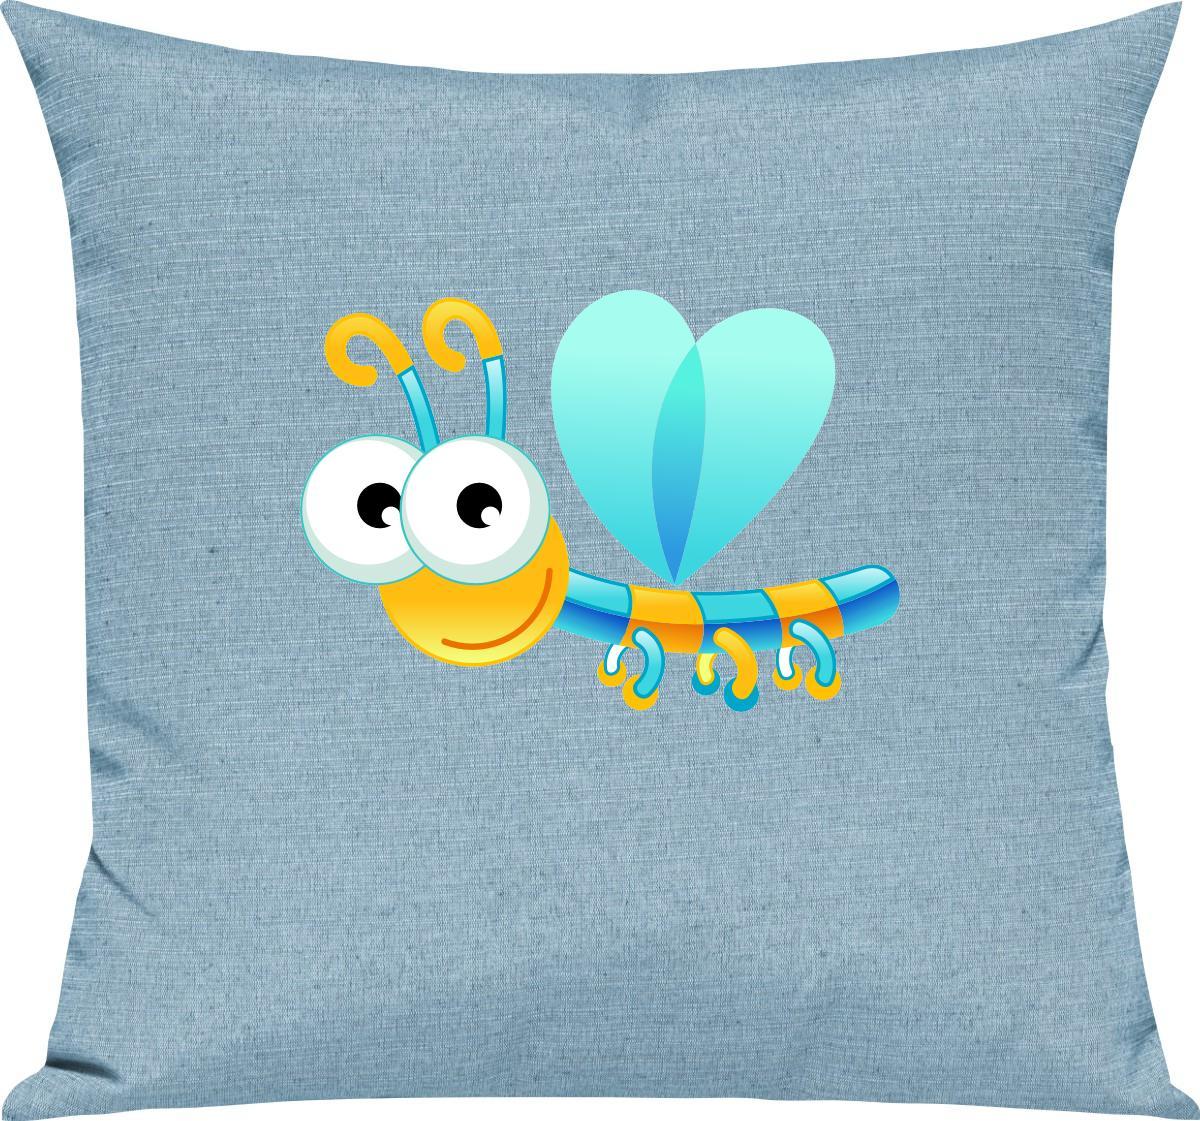 Indexbild 16 - Kinder Kissen, Libelle Insekt Tiere Tier Natur, Kuschelkissen Couch Deko,